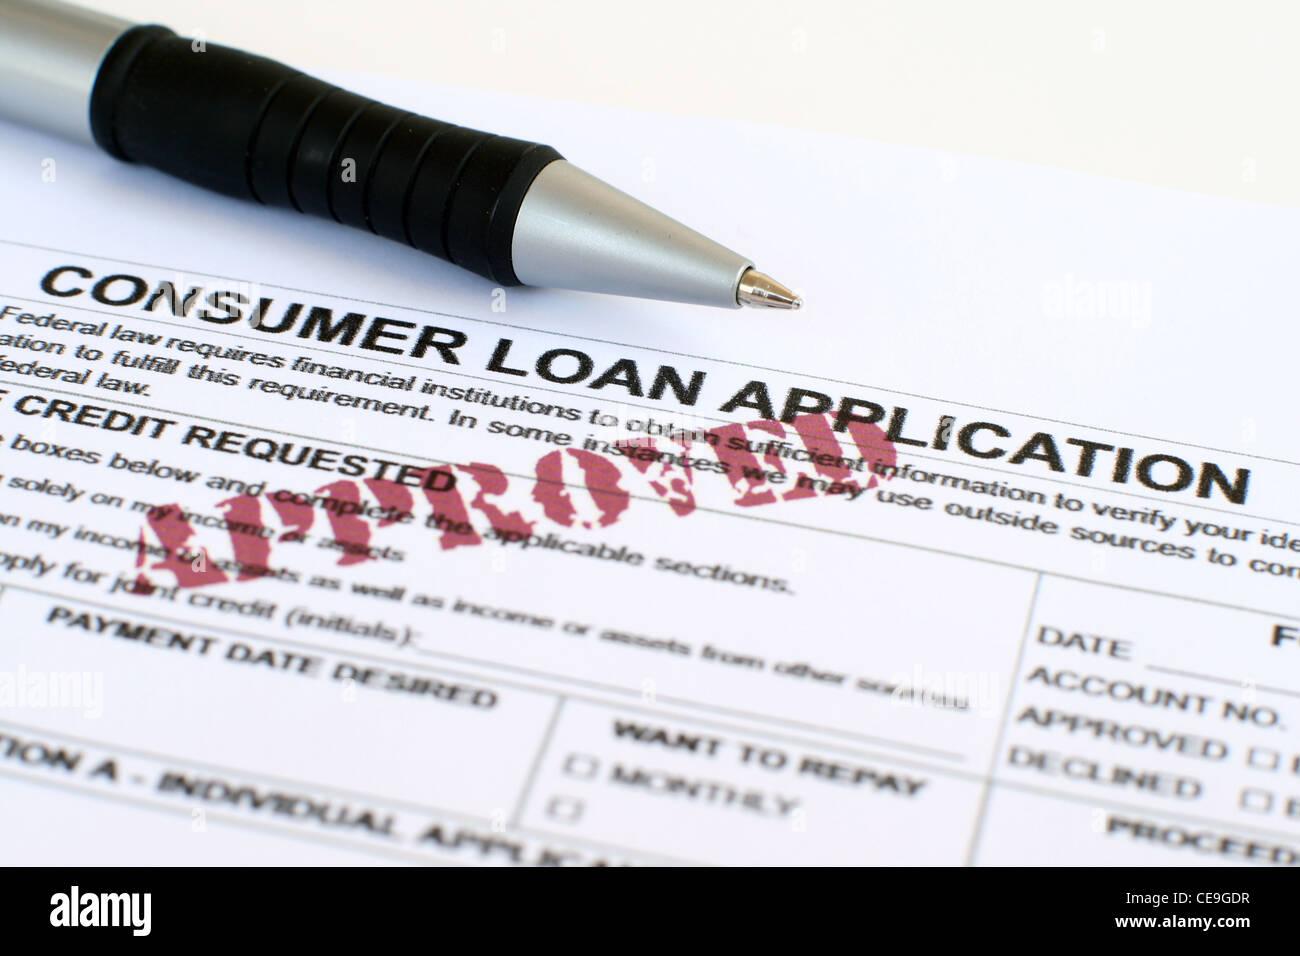 consumer loan application stock photo 43236419 alamy